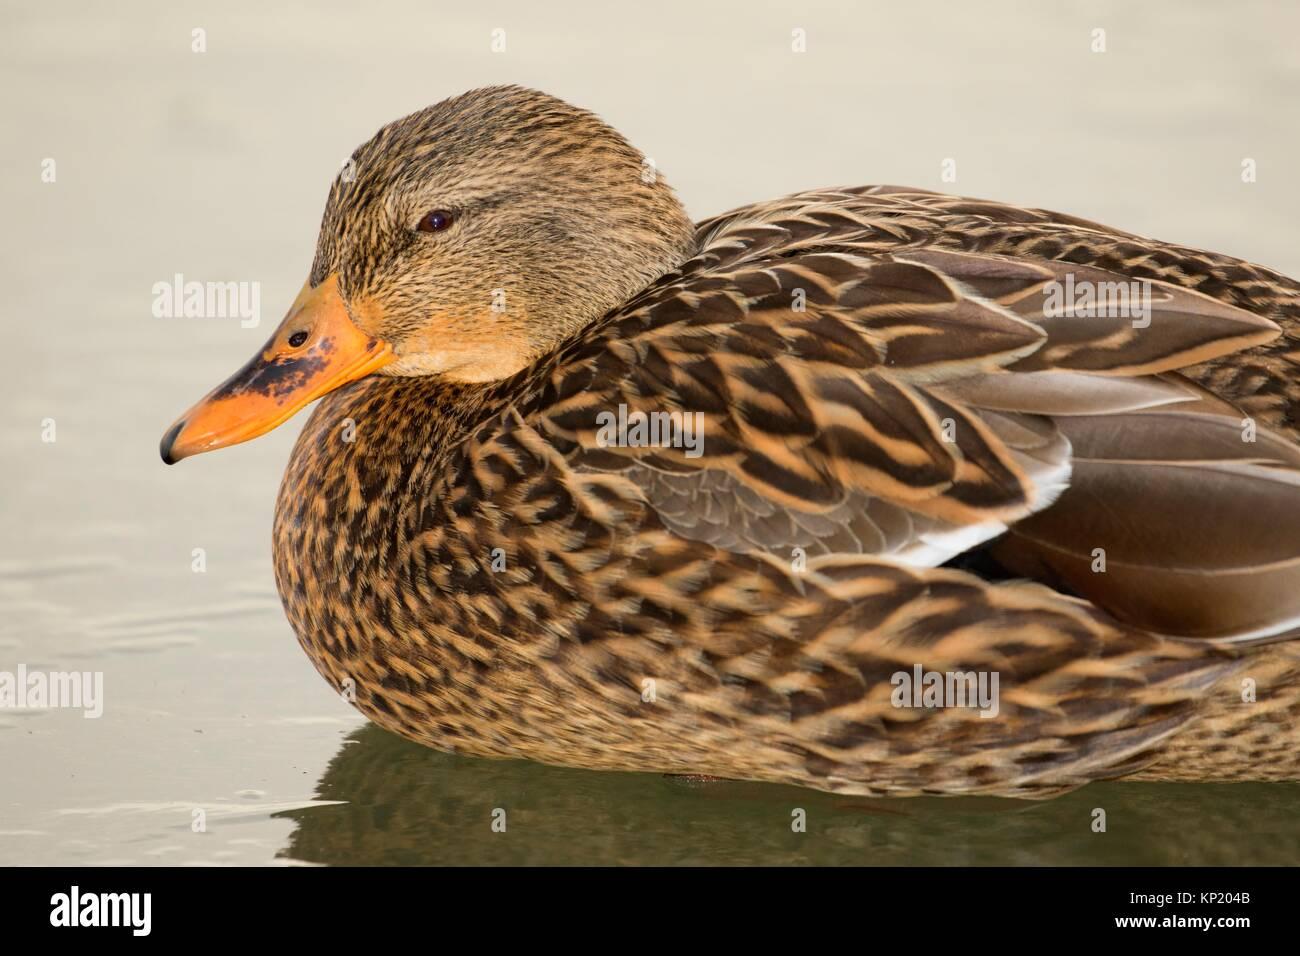 Mallard, George C Reifel Migratory Bird Sanctuary, British Columbia, Canada. - Stock Image